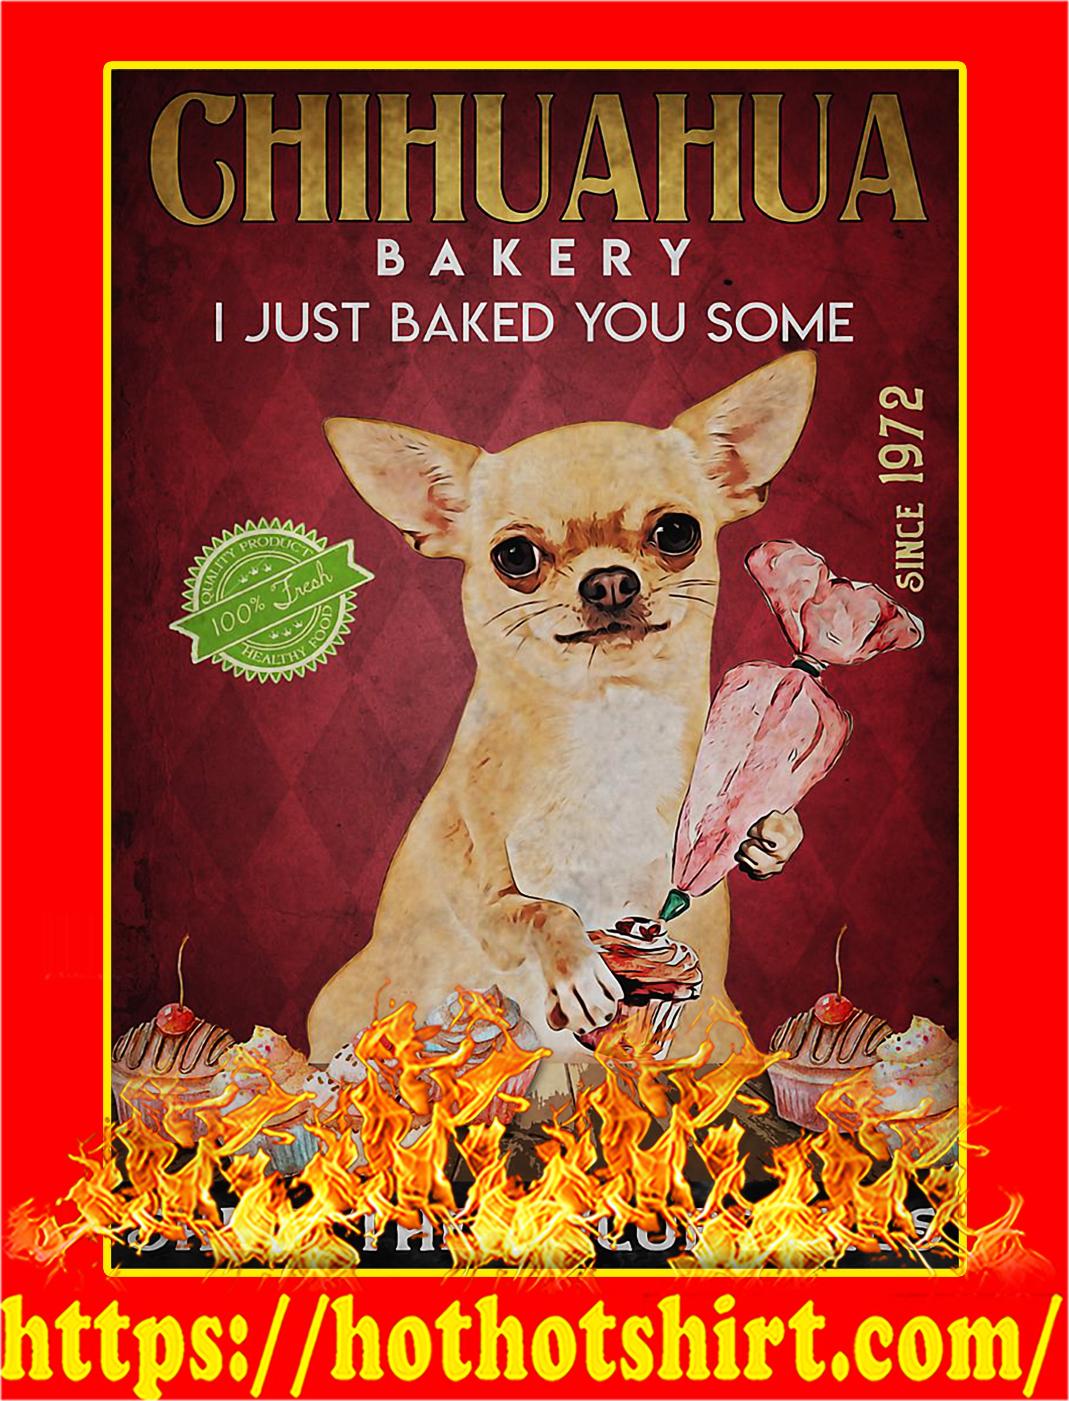 Chihuahua bakery shut the fucupcakes poster - A4